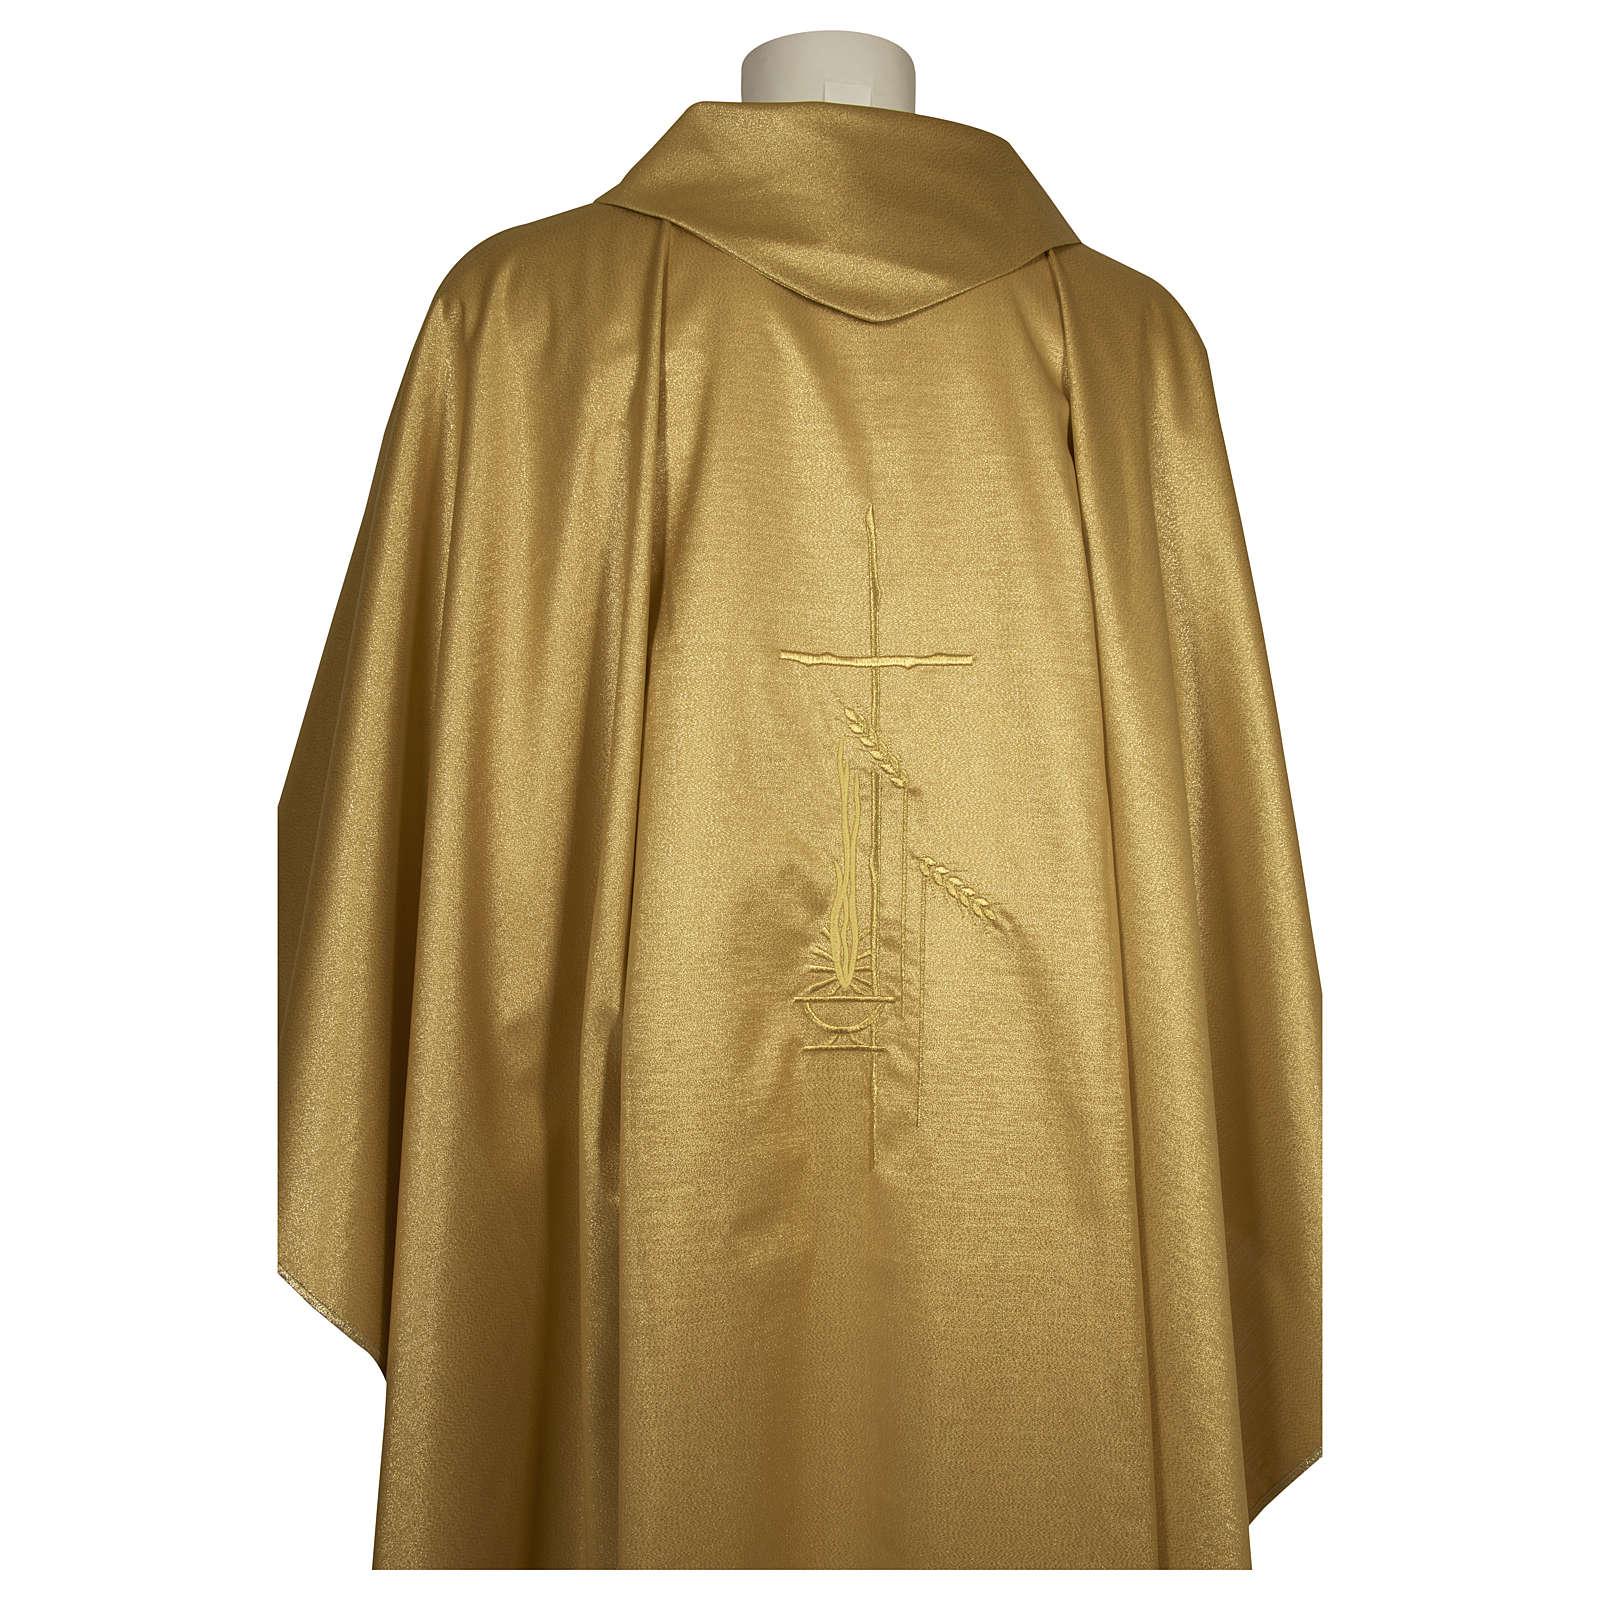 Casula raso 80% lana 20% lurex disegno croce sottile spighe lanterna 4